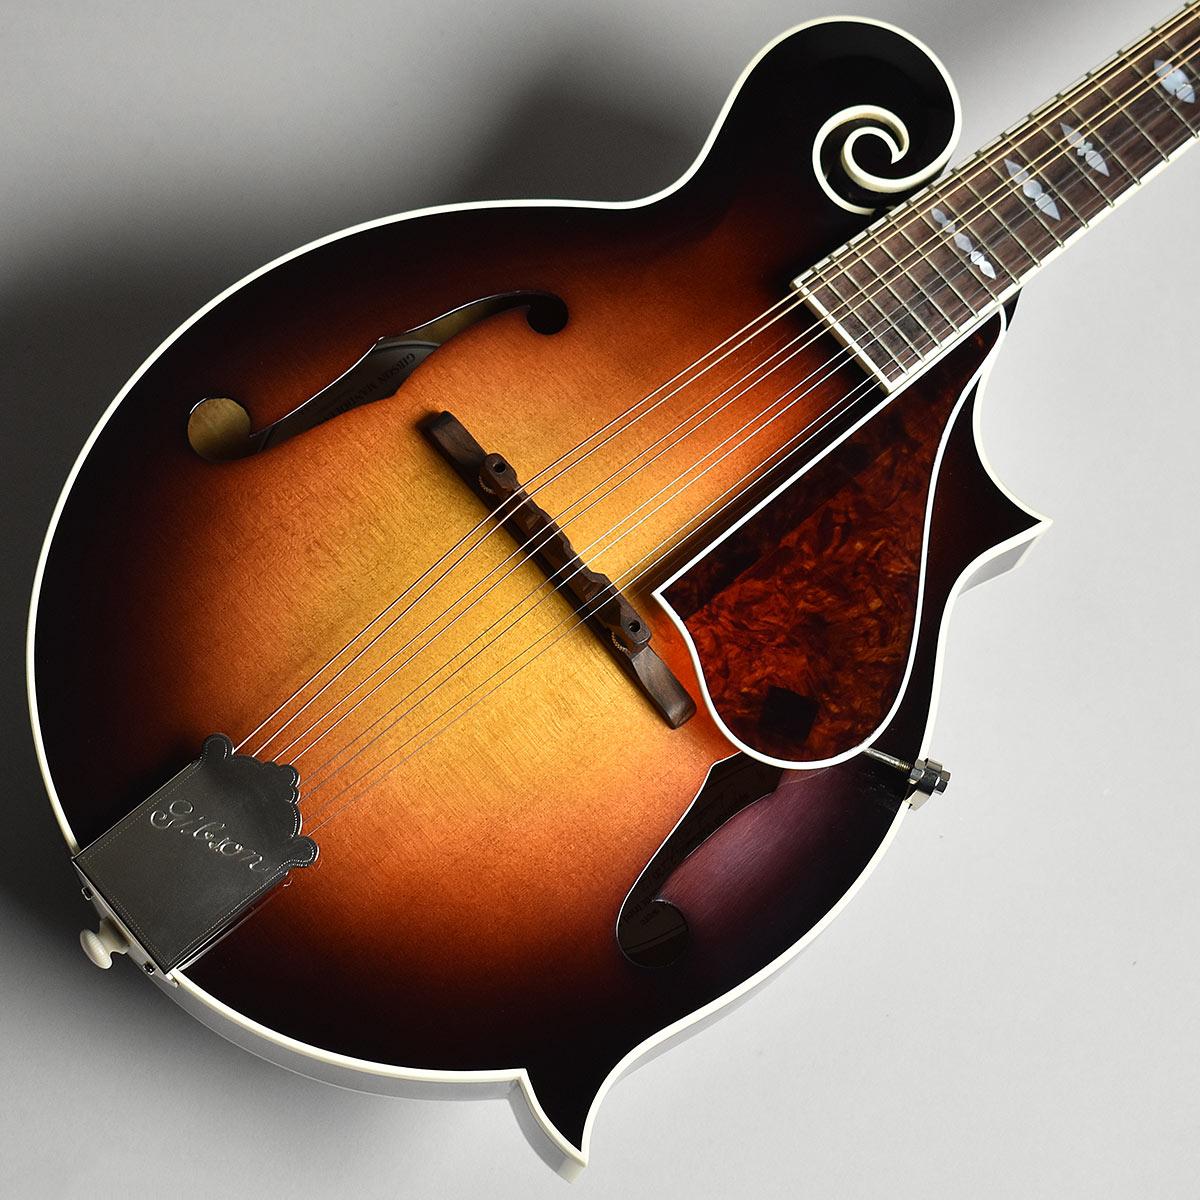 Gibson Custom Shop F-7 フラットマンドリン 【ギブソン カスタムショップ】【現地買い付け品】【未展示品】